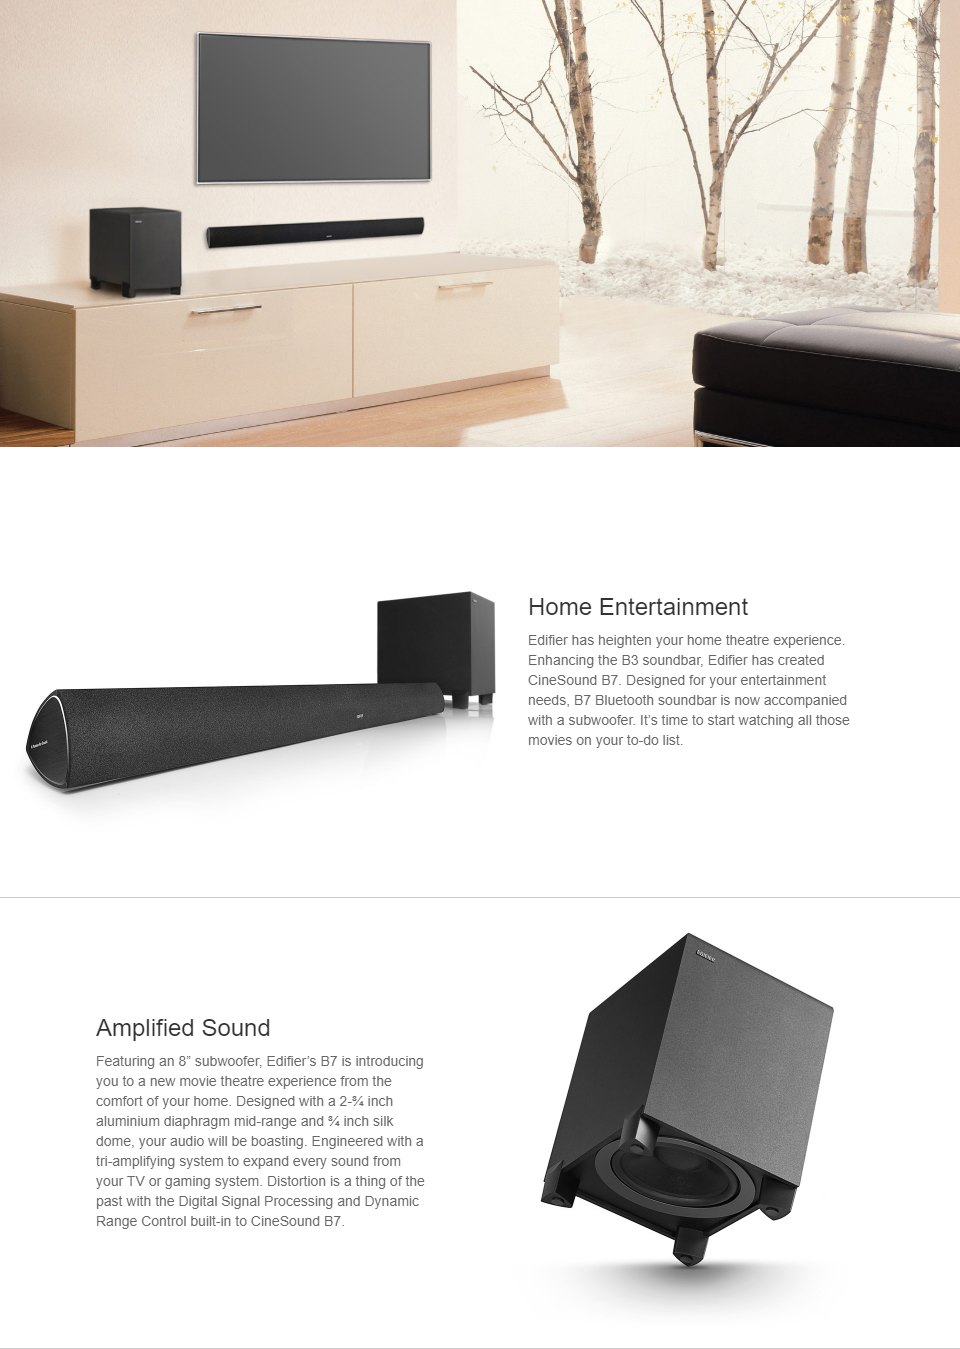 Edifier B7 CineSound Soundbar Speaker System Black features